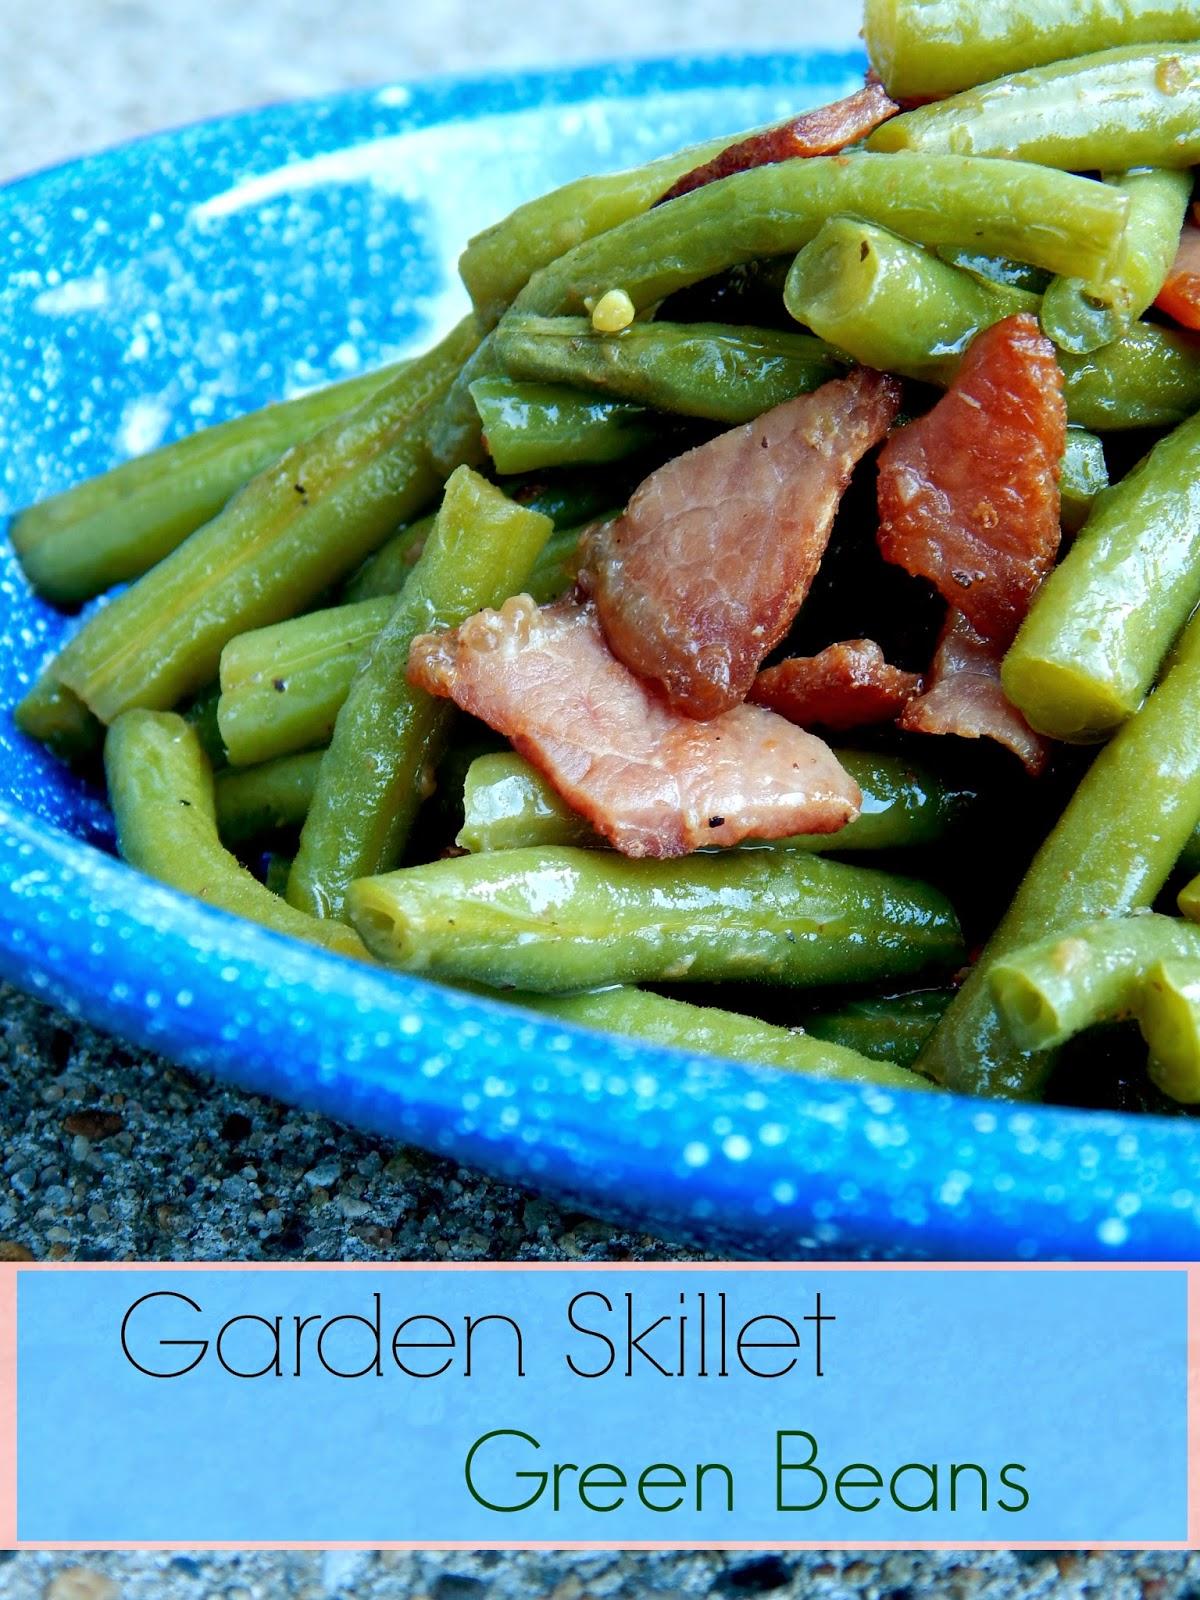 Garden Skillet Green Beans